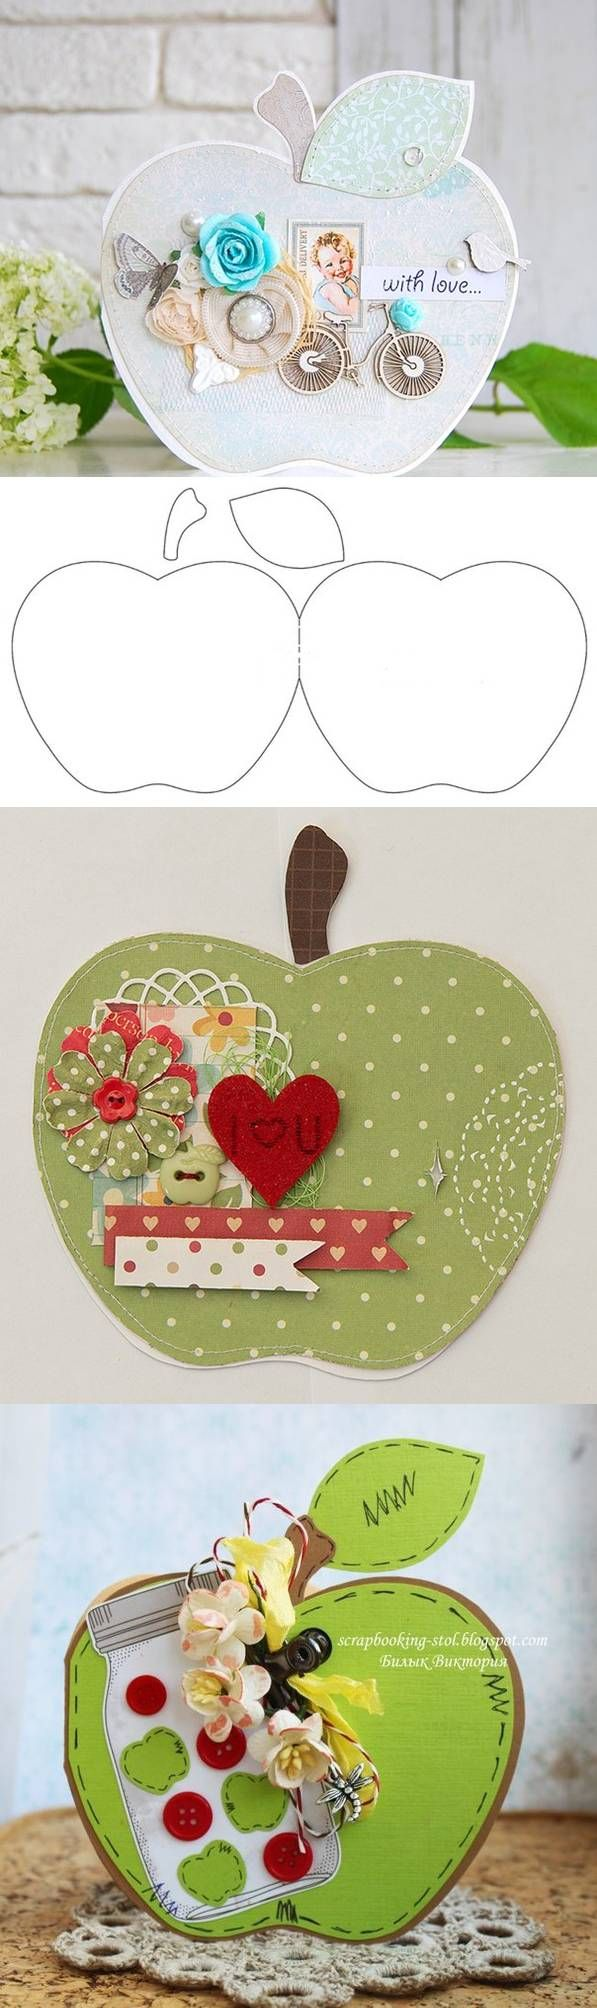 DIY Card in the Form of Apple DIY Projects | UsefulDIY.com Follow Us on Facebook --> https://www.facebook.com/UsefulDiy